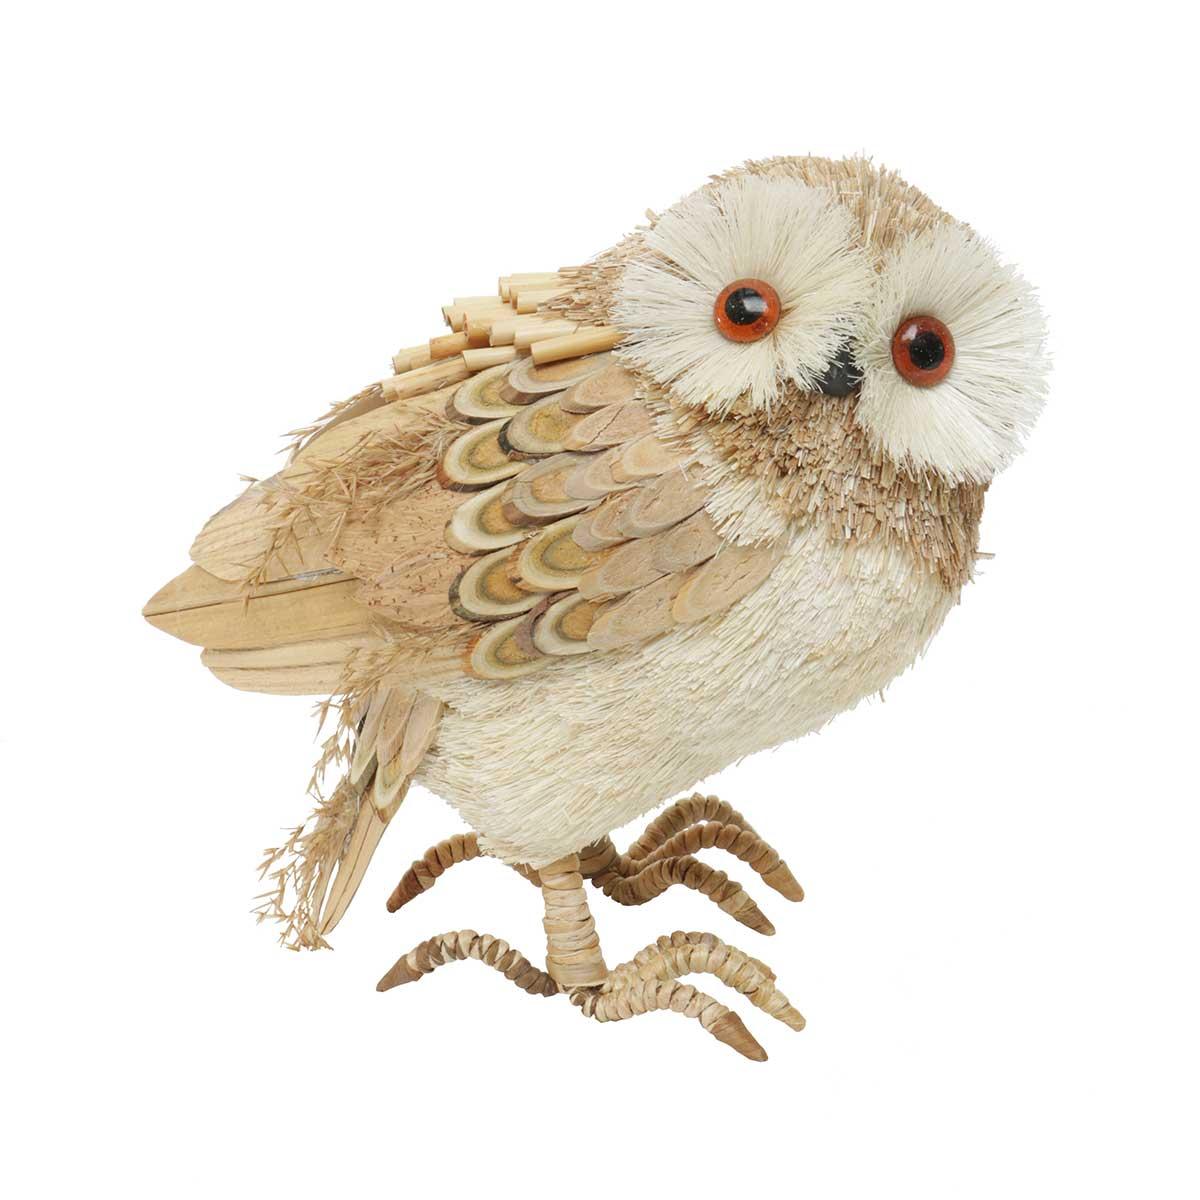 "Farmhouse Owl Standing 4.25""x7.5""x7.75"""